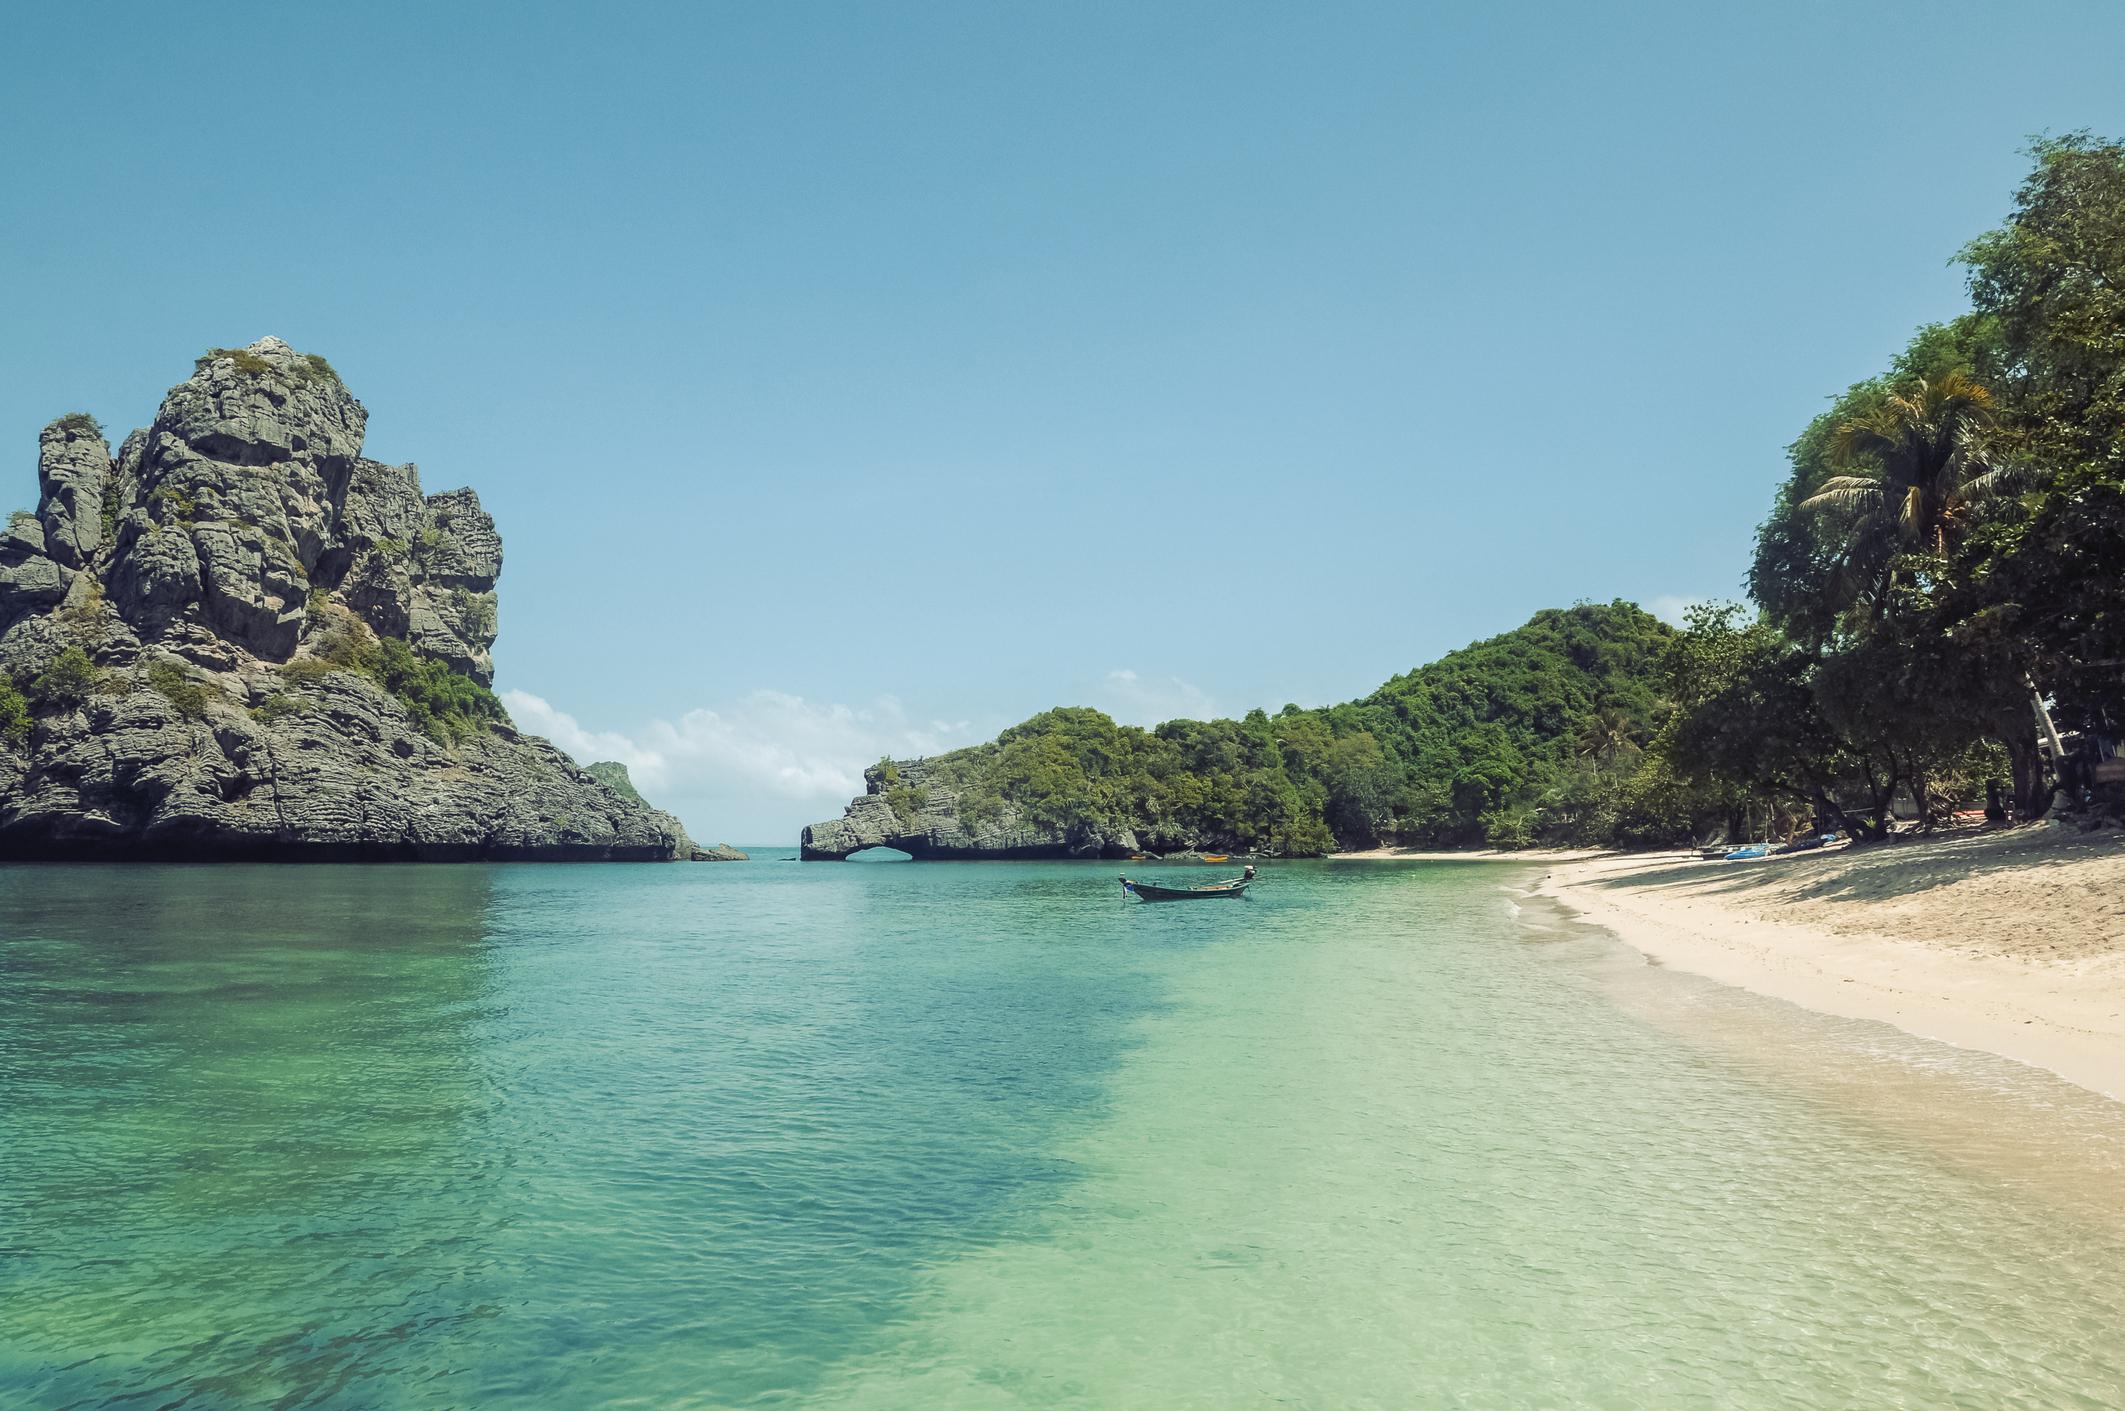 Koh Phangan, Thailand: A rejuvenating retreat at a seaside sanctuary